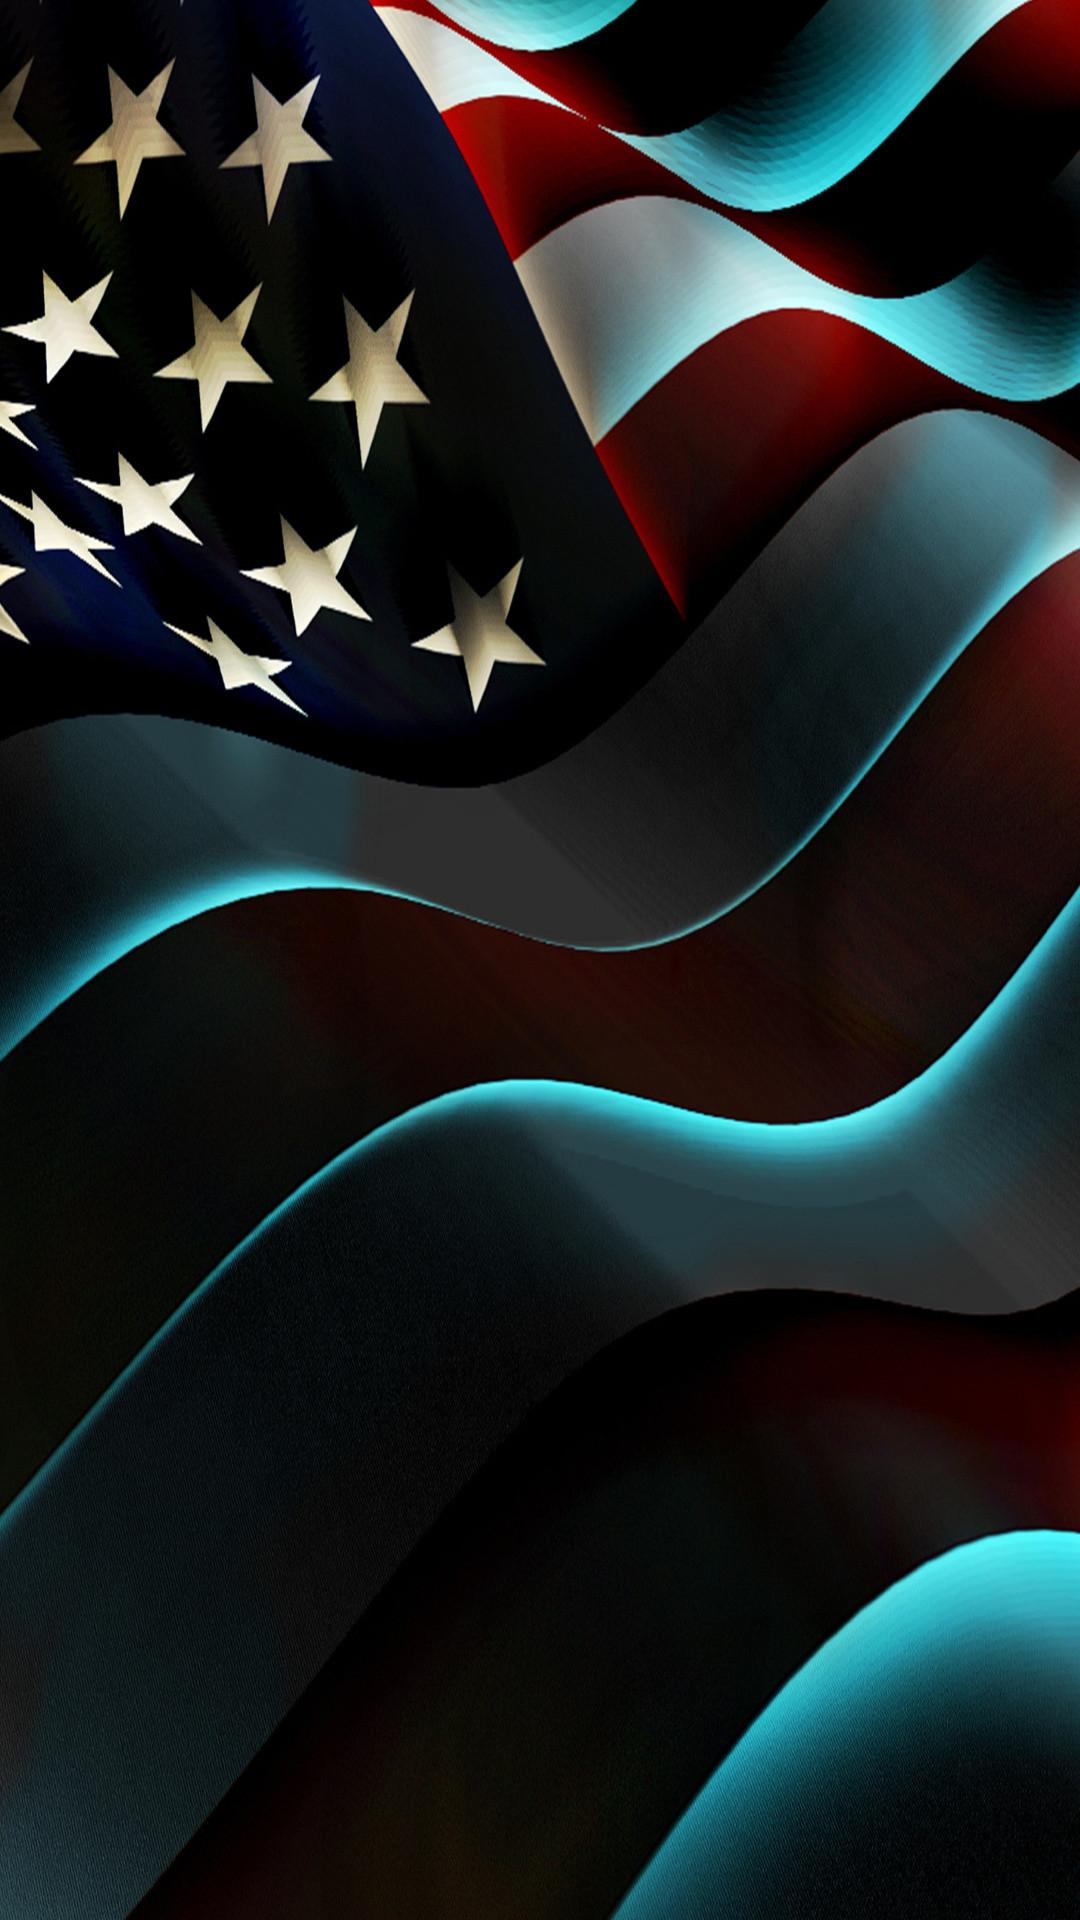 Res: 1080x1920, USA Flag Mobile HD Wallpaper